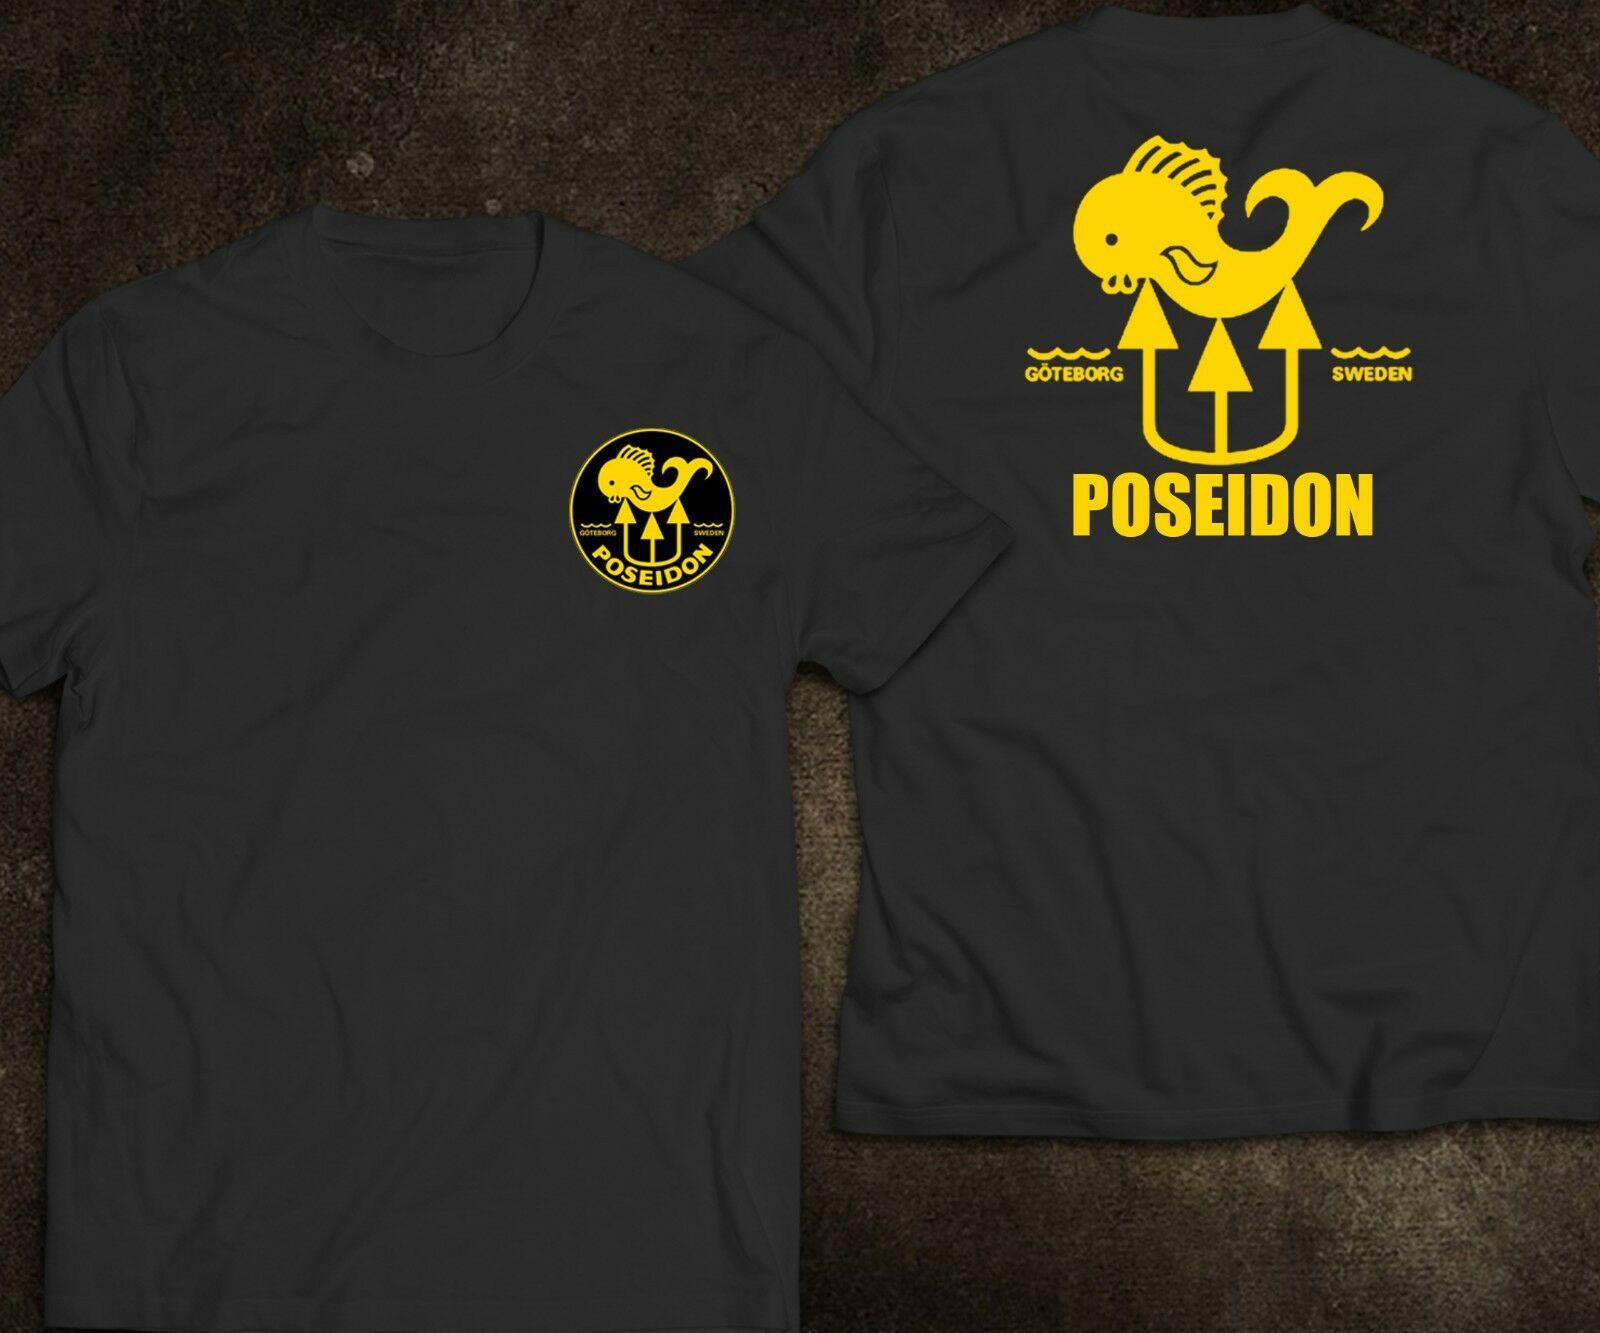 2019 Funny New Scuba Diving Poseidon Men'S Black White Navy T-Shirt Double Side Unisex Tee